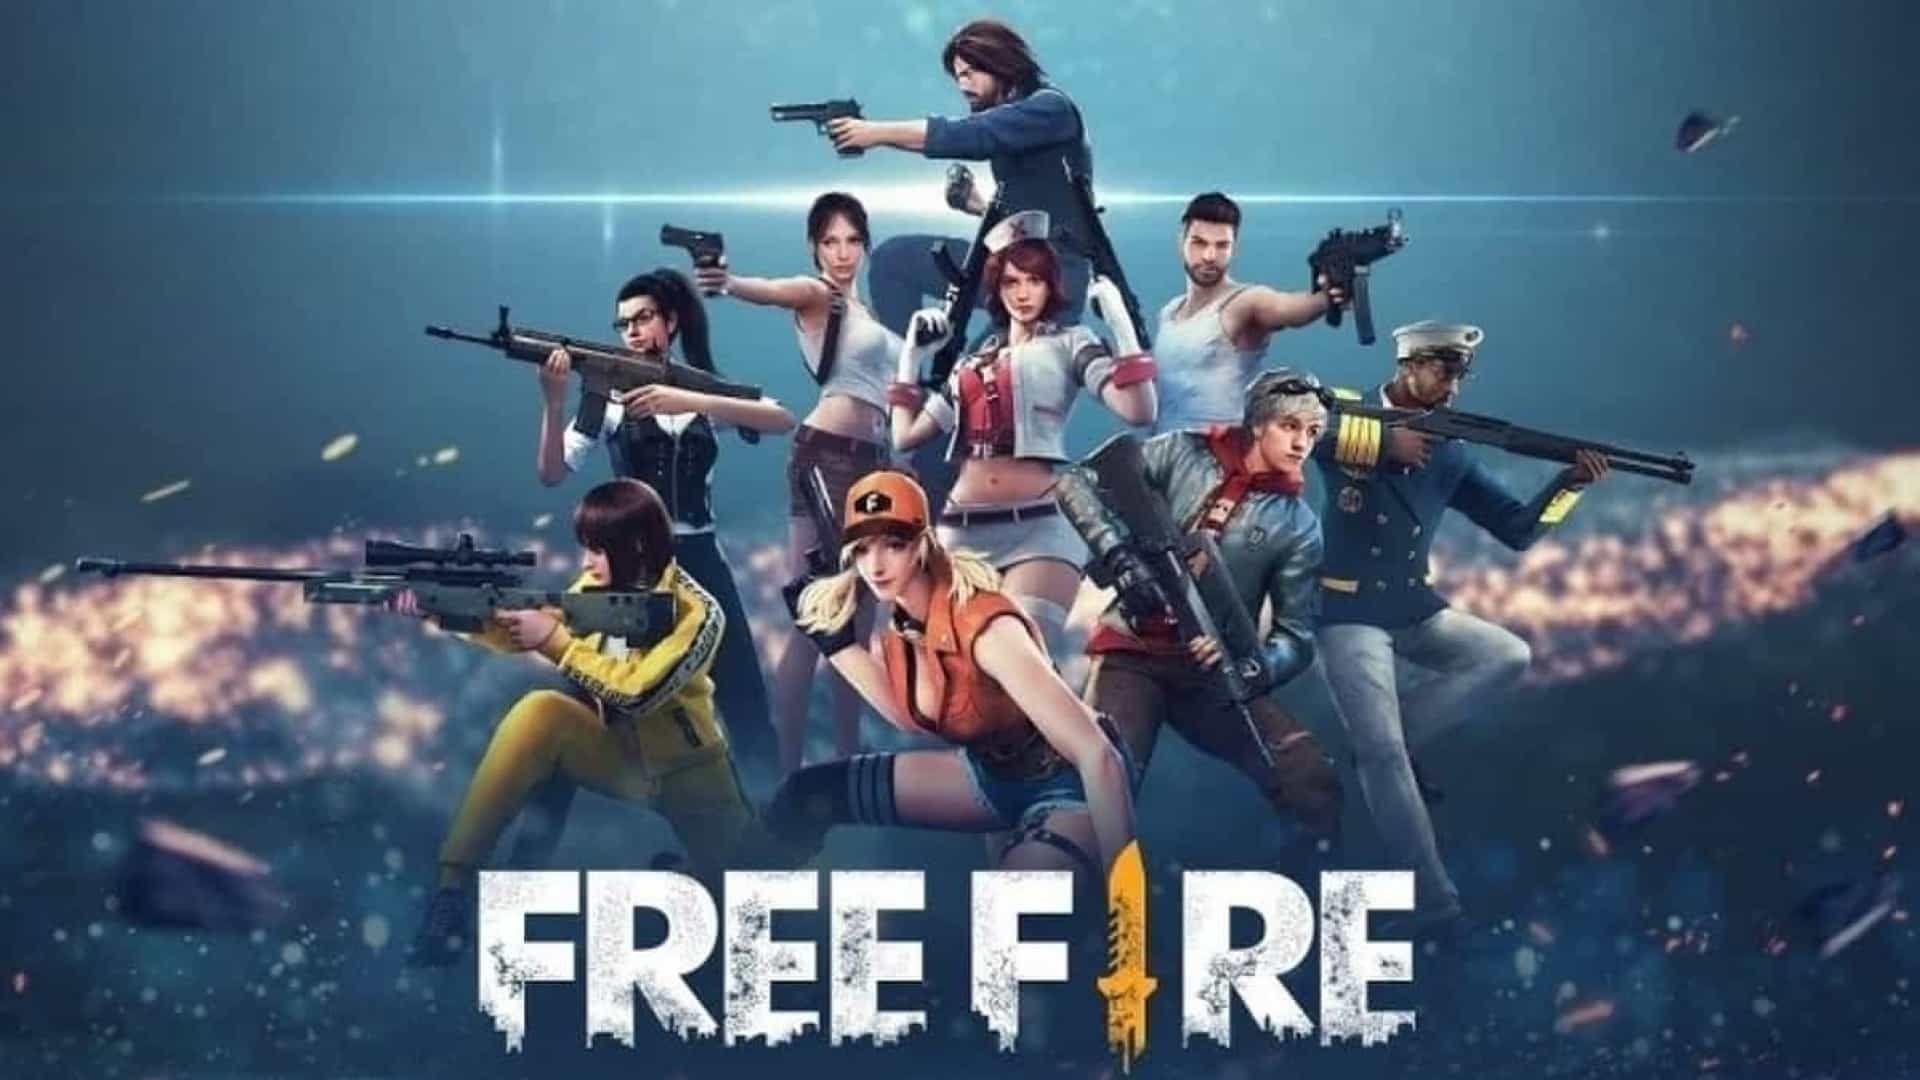 Infonavweb Noticias Ciencia E Tecnologia Diversao E Arte Videos E Midia Free Fire Cre Garena Free Fire Free Fire Free Fire Diamonds